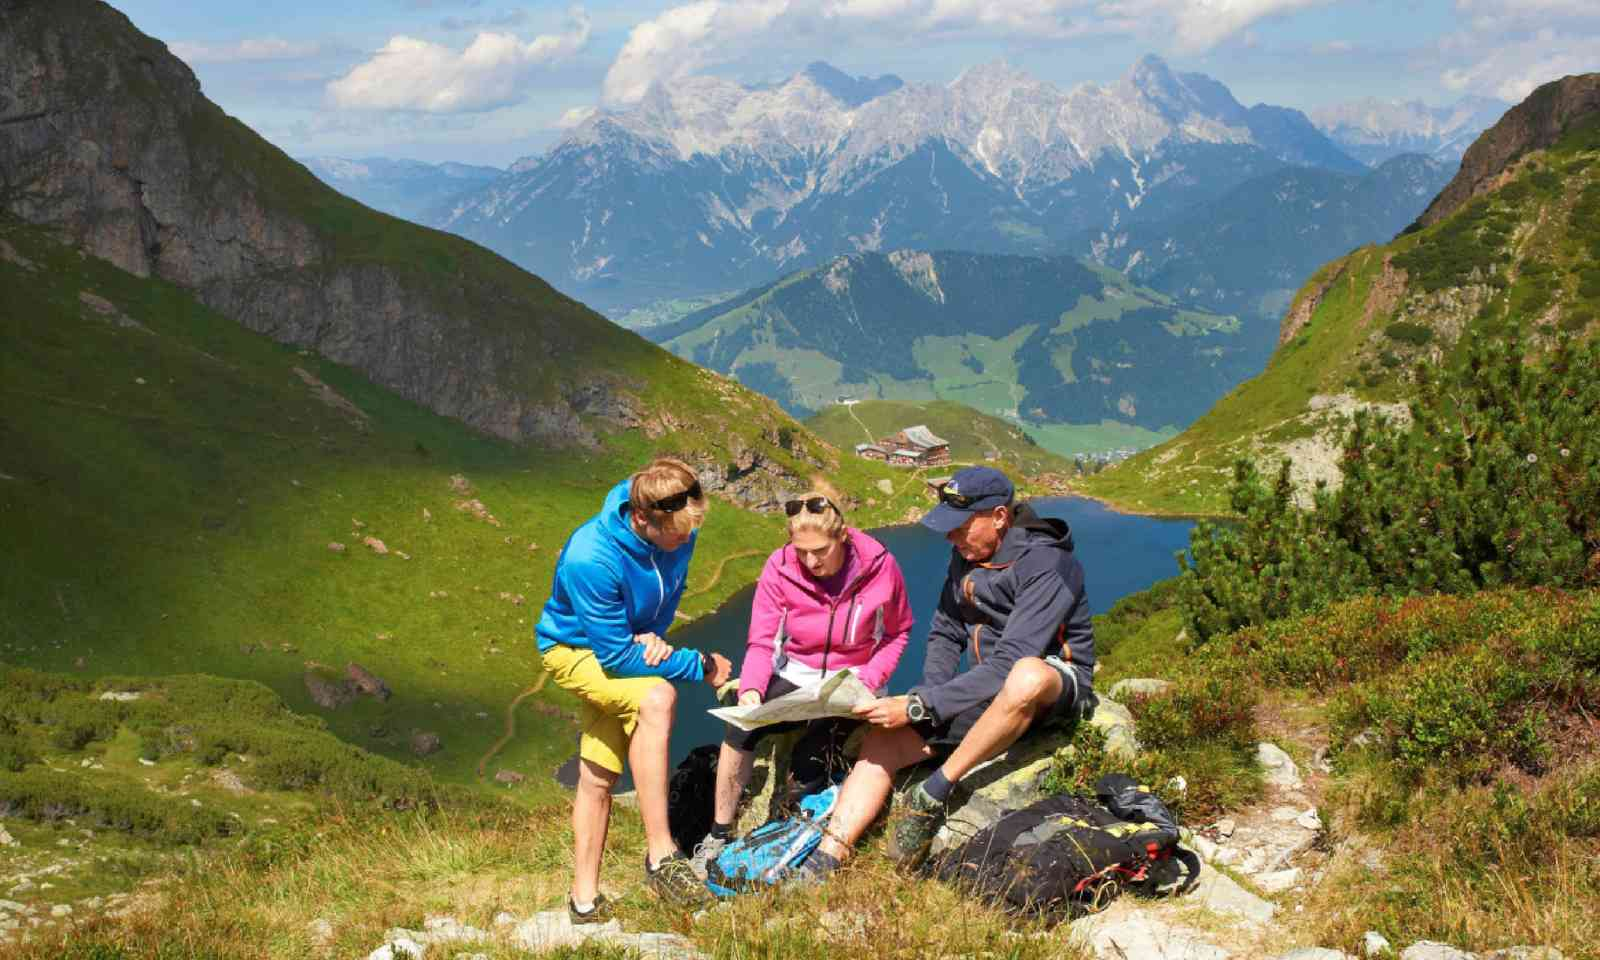 High altitude trekking in Kitzbühel Alpen